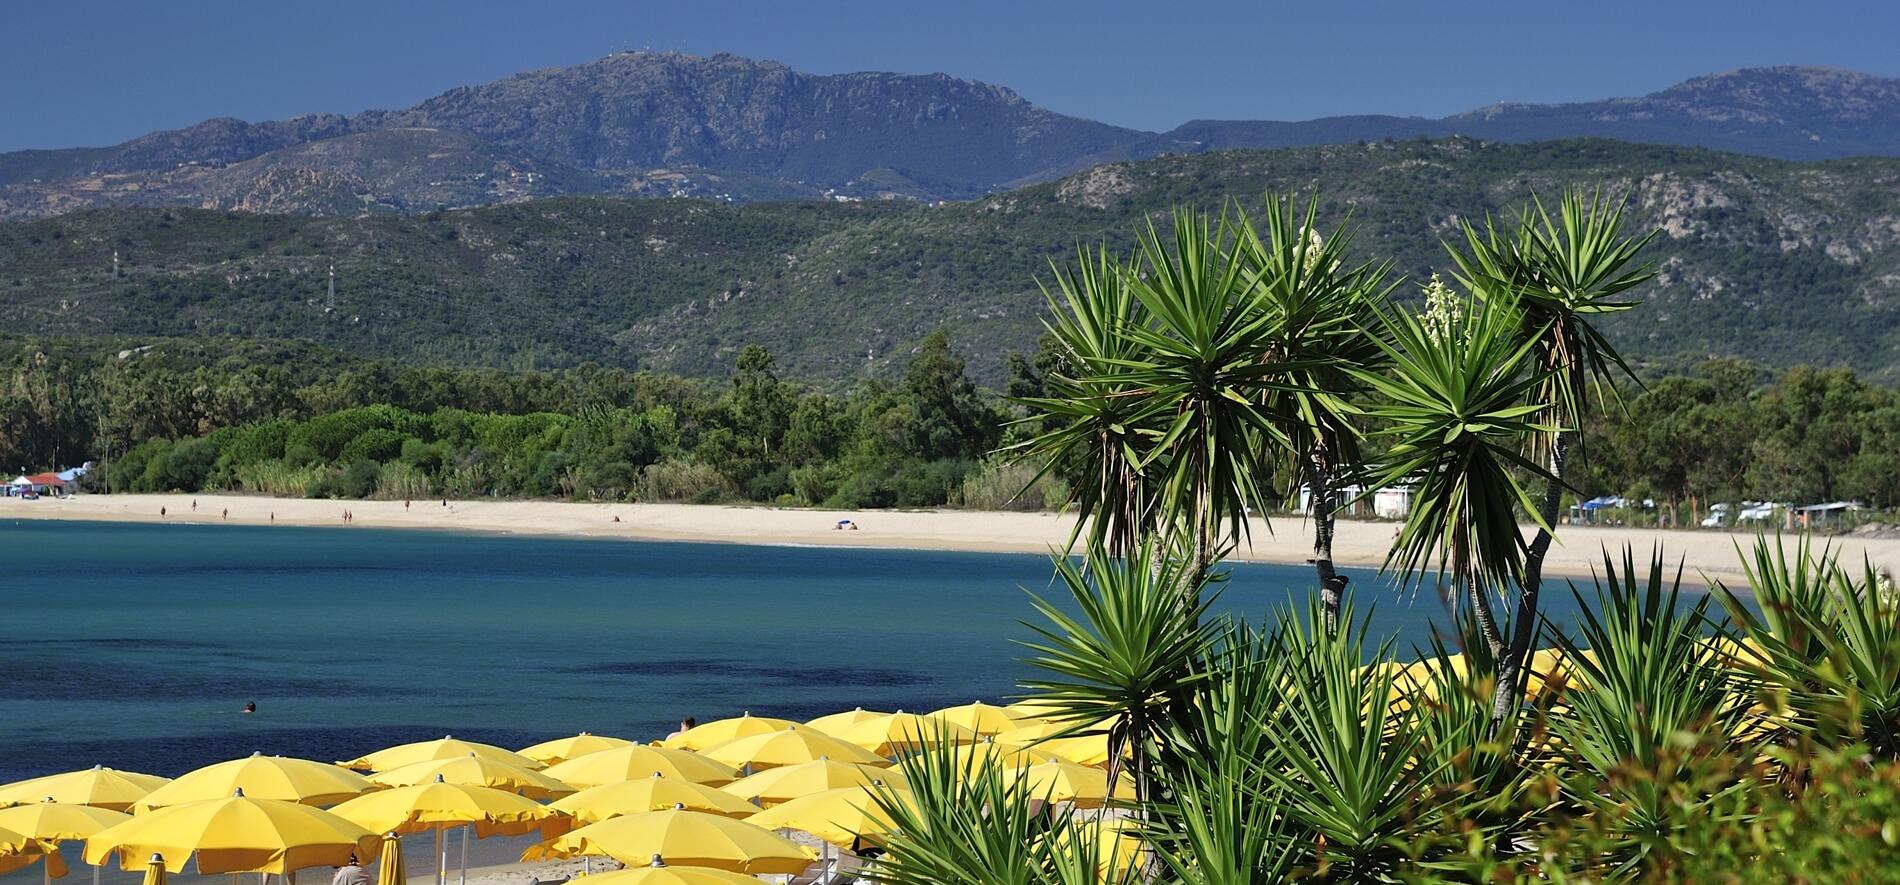 _hotel_club_saraceno_resort_con_piscina_sardegna_05